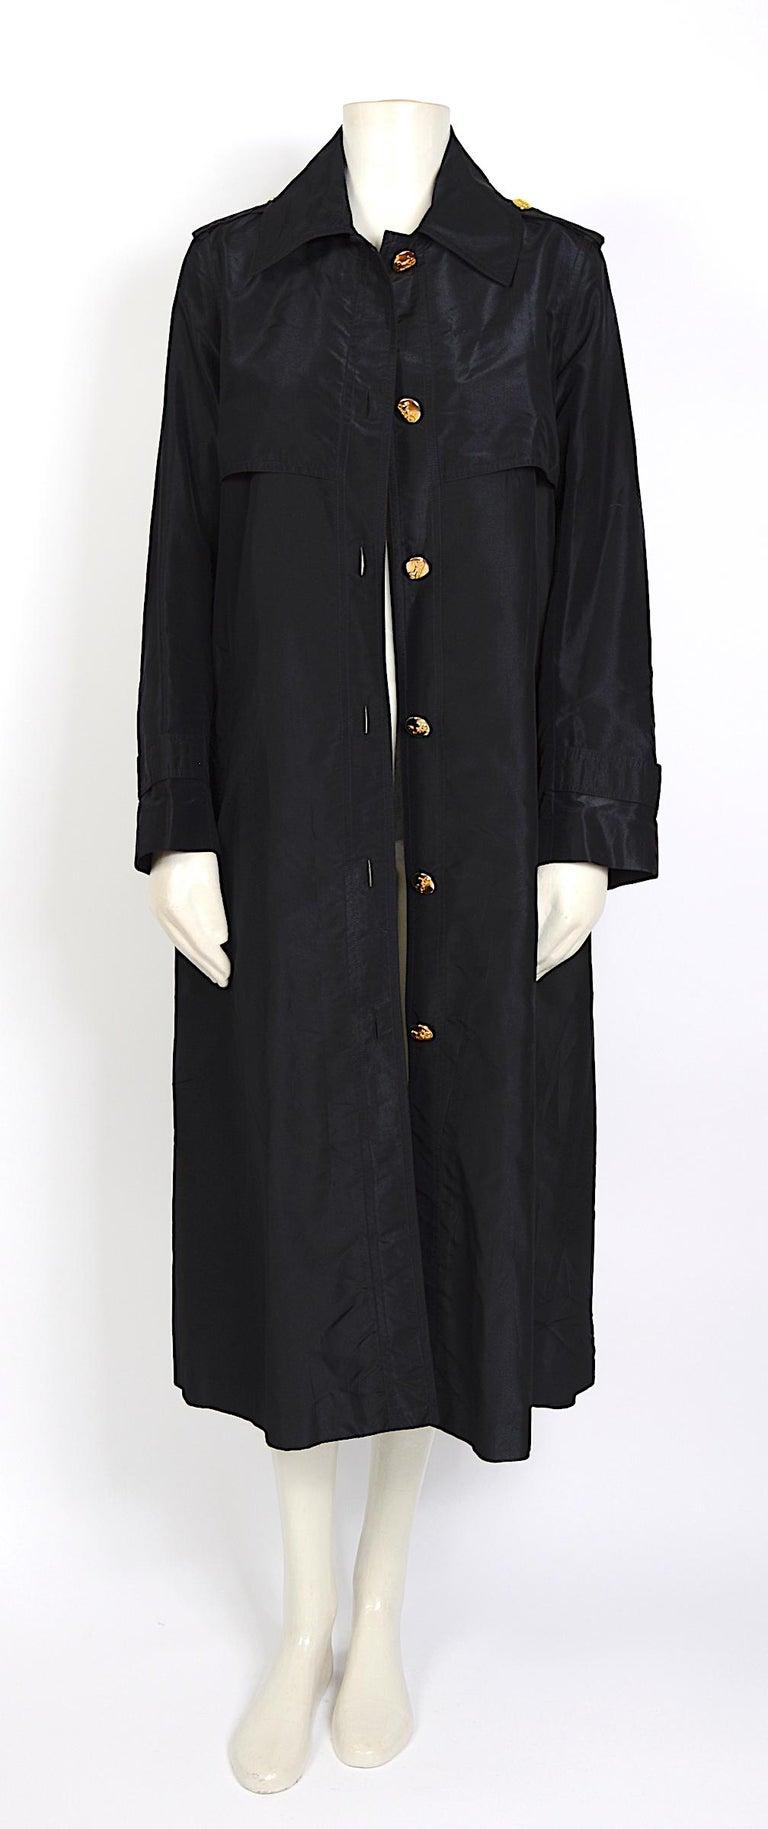 Celine vintage signature gold buttons and black silk crispy taffeta coat For Sale 1